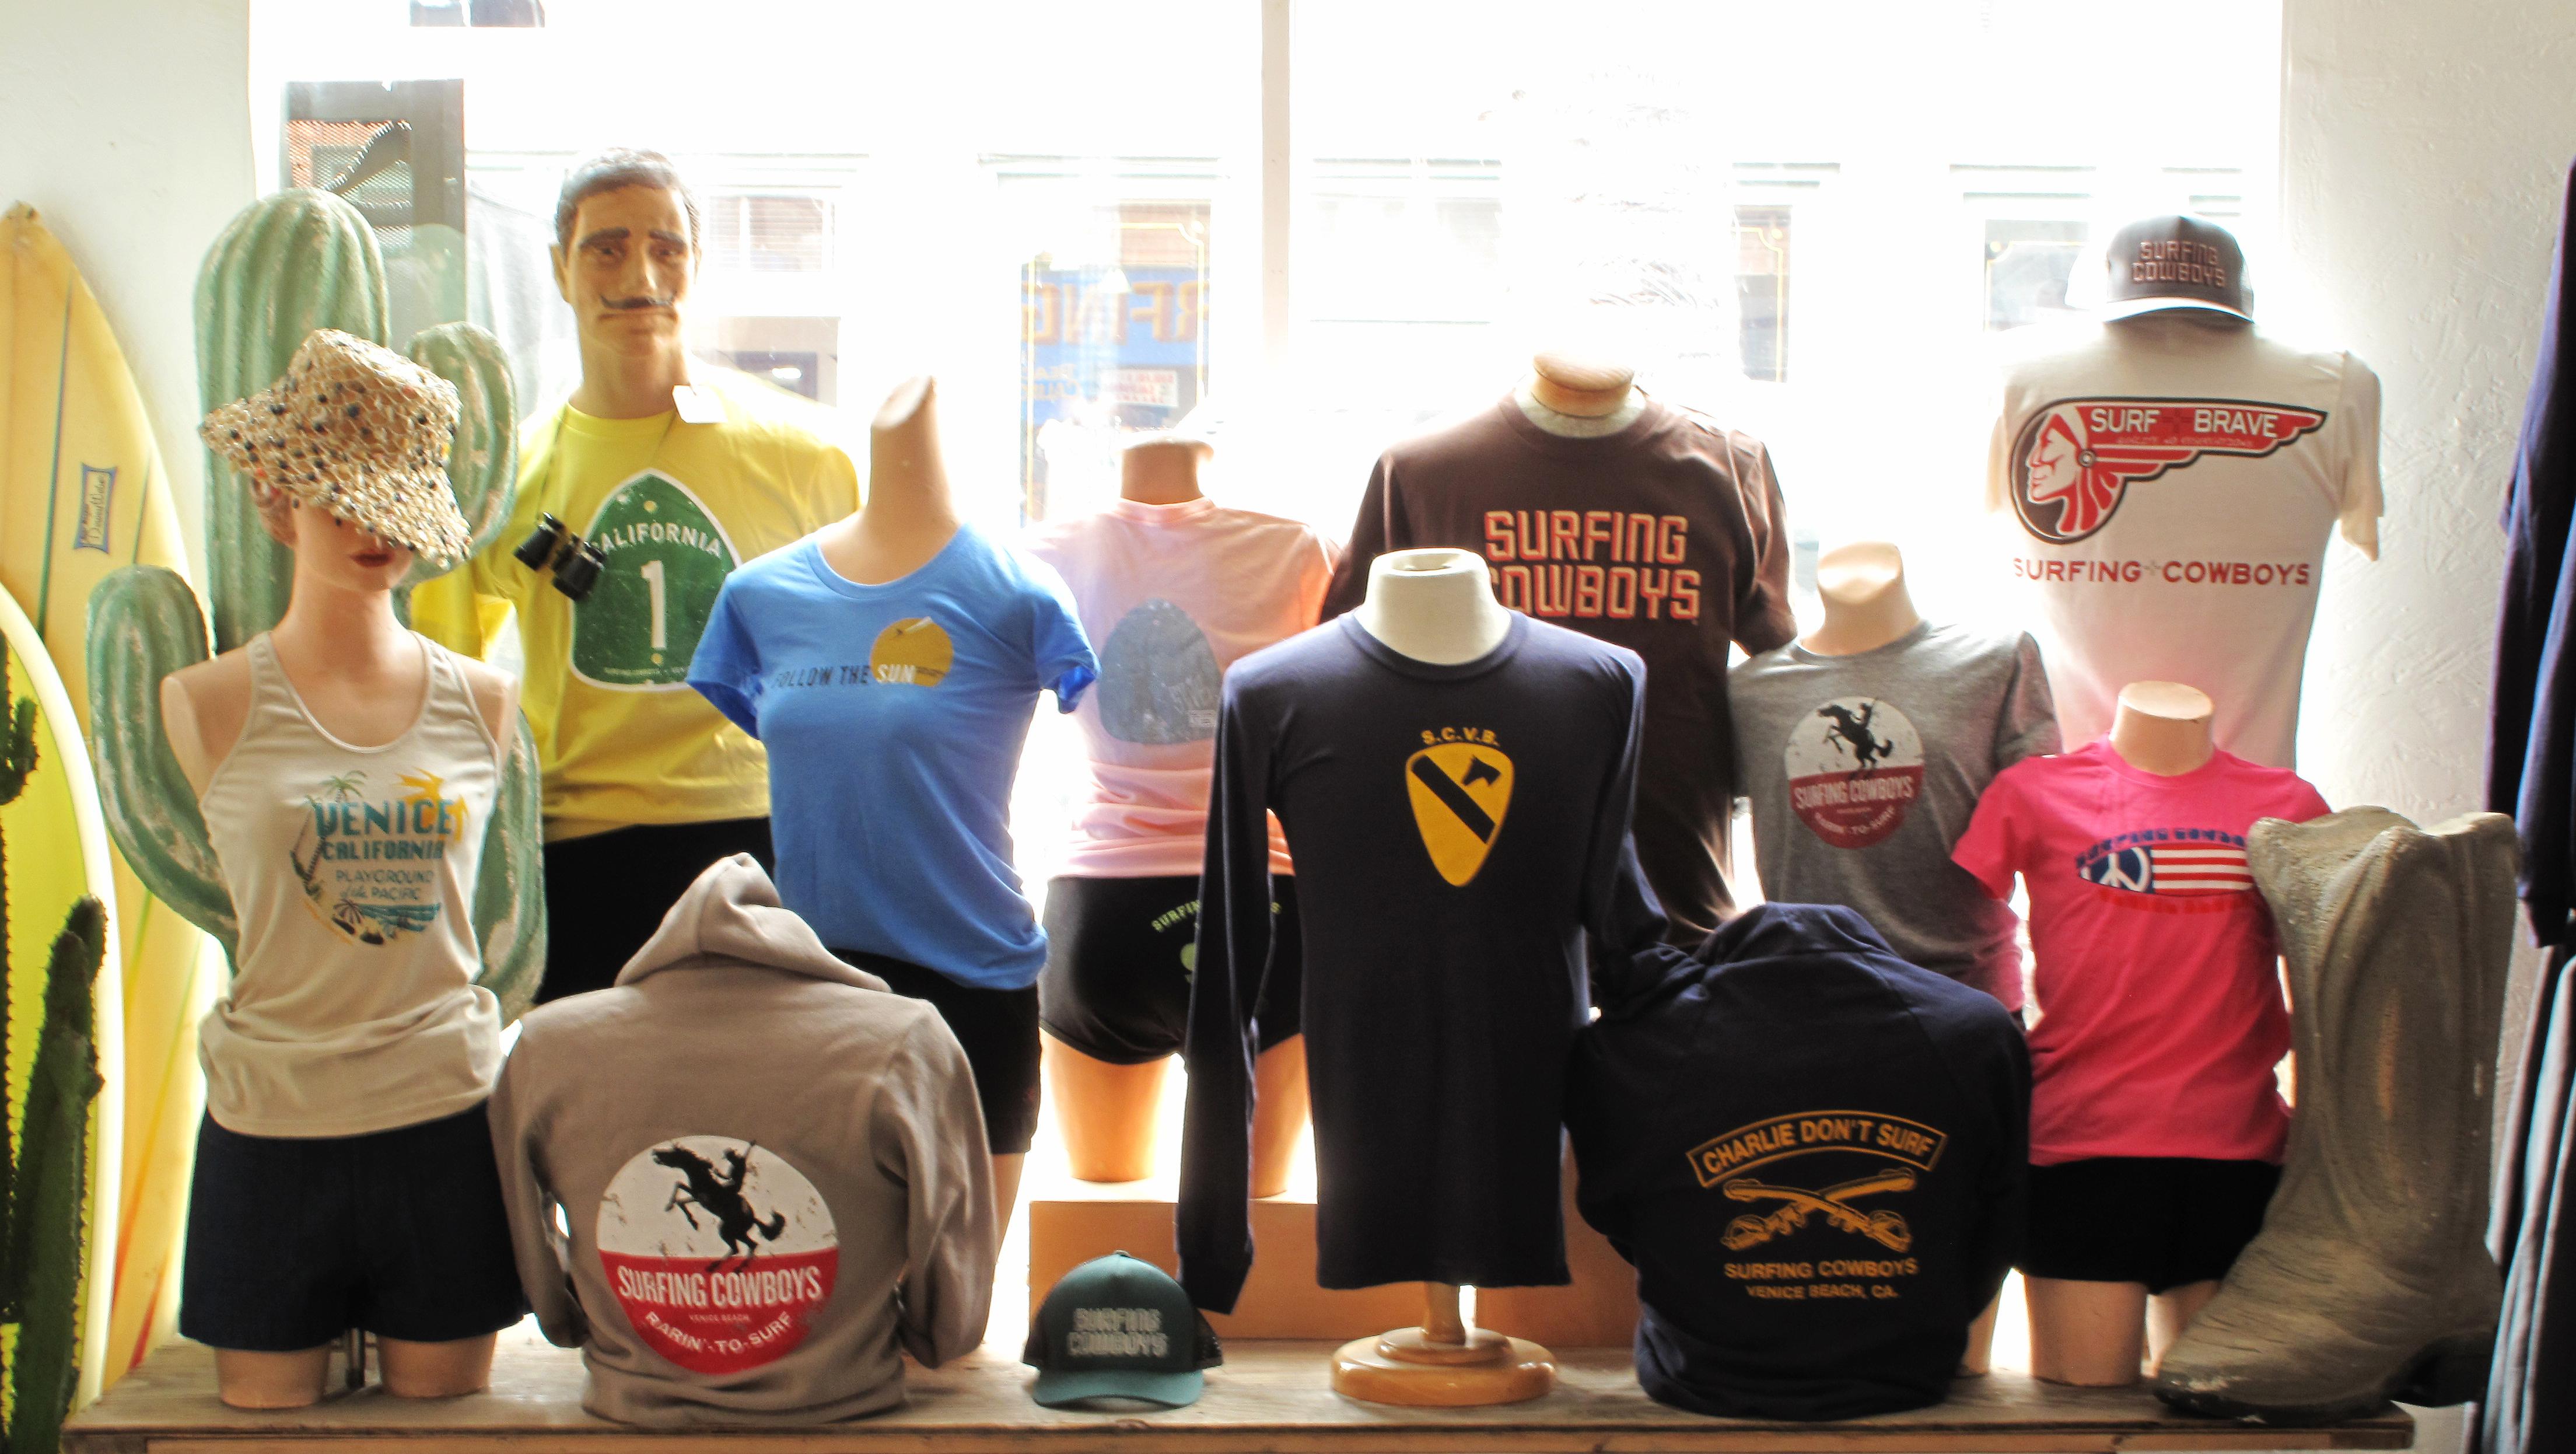 sc-tshirt-collection.jpg